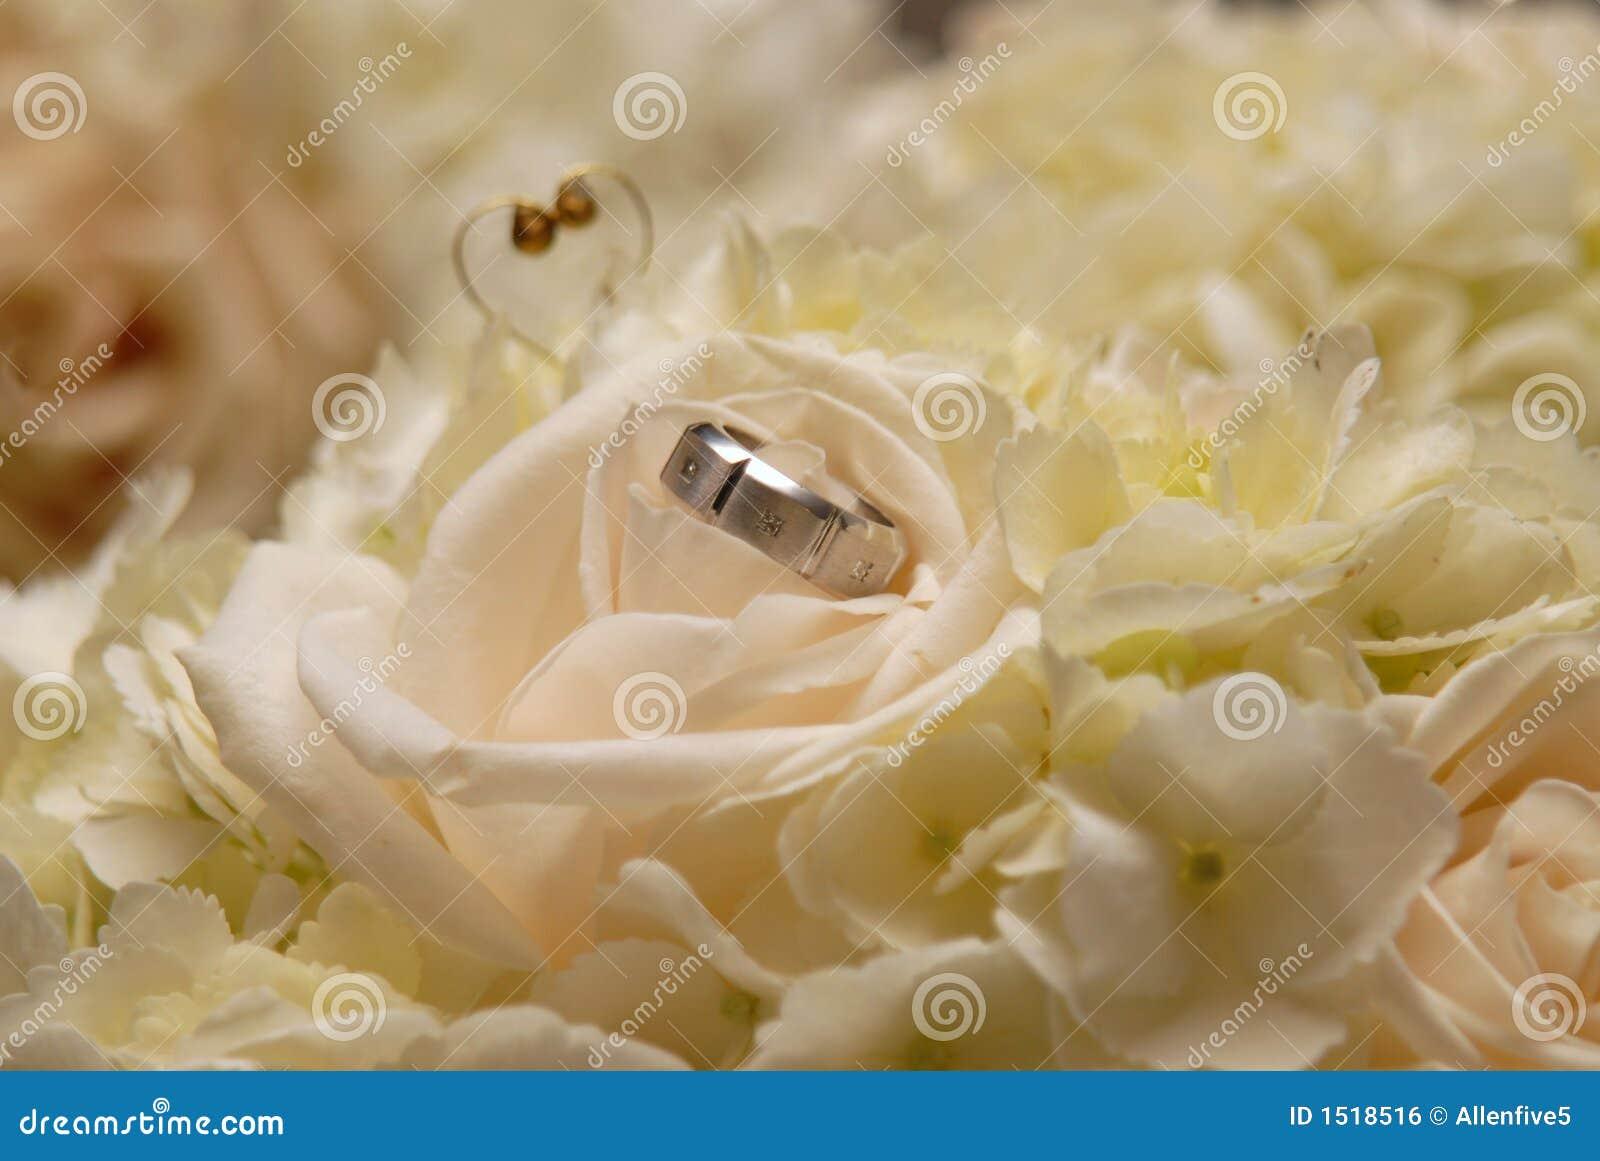 Groom s ring on Bride s flower bouquet